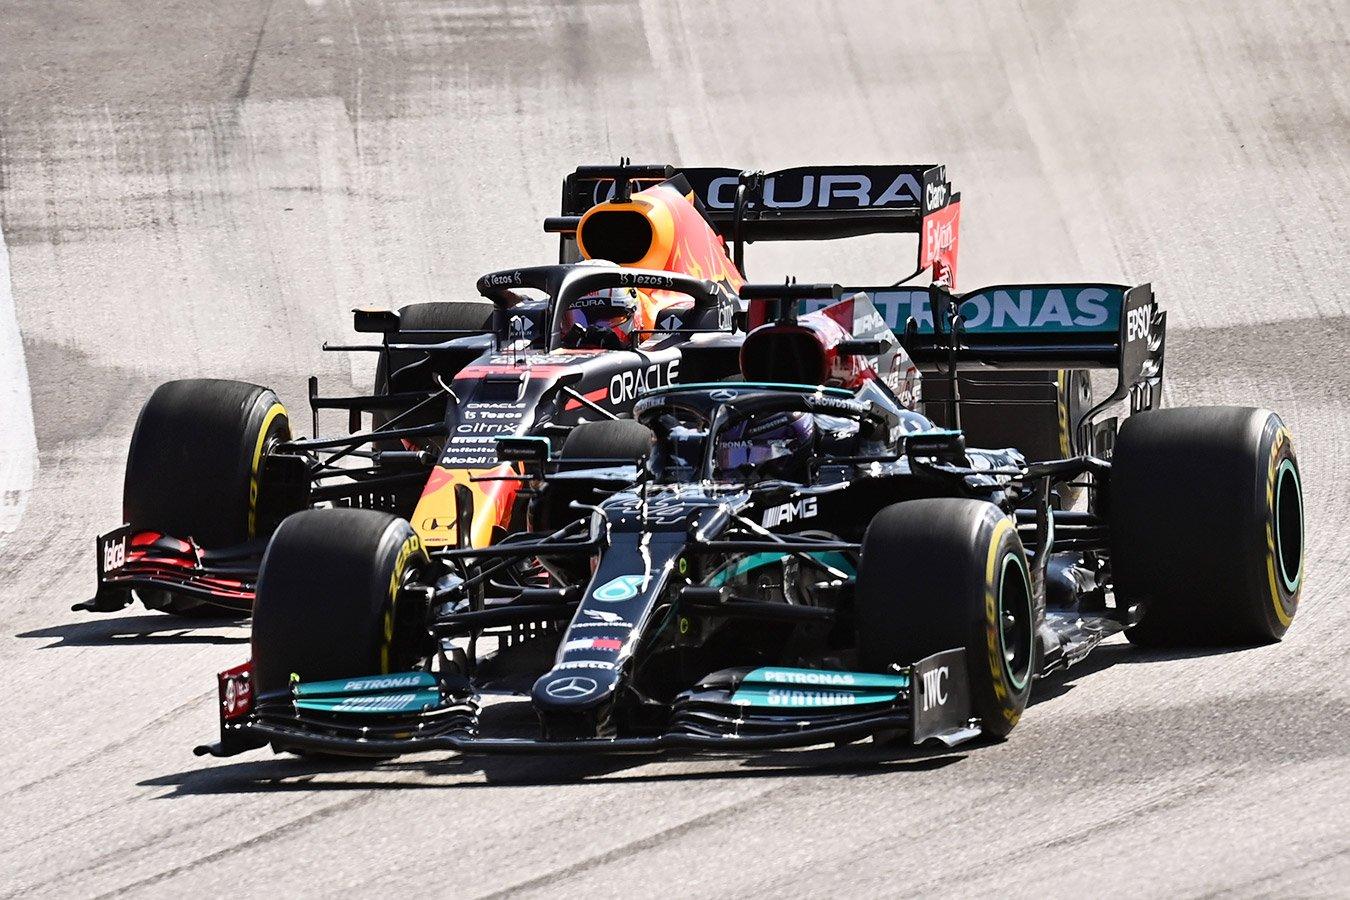 Гран-при США Формулы-1: Ферстаппен выиграл гонку